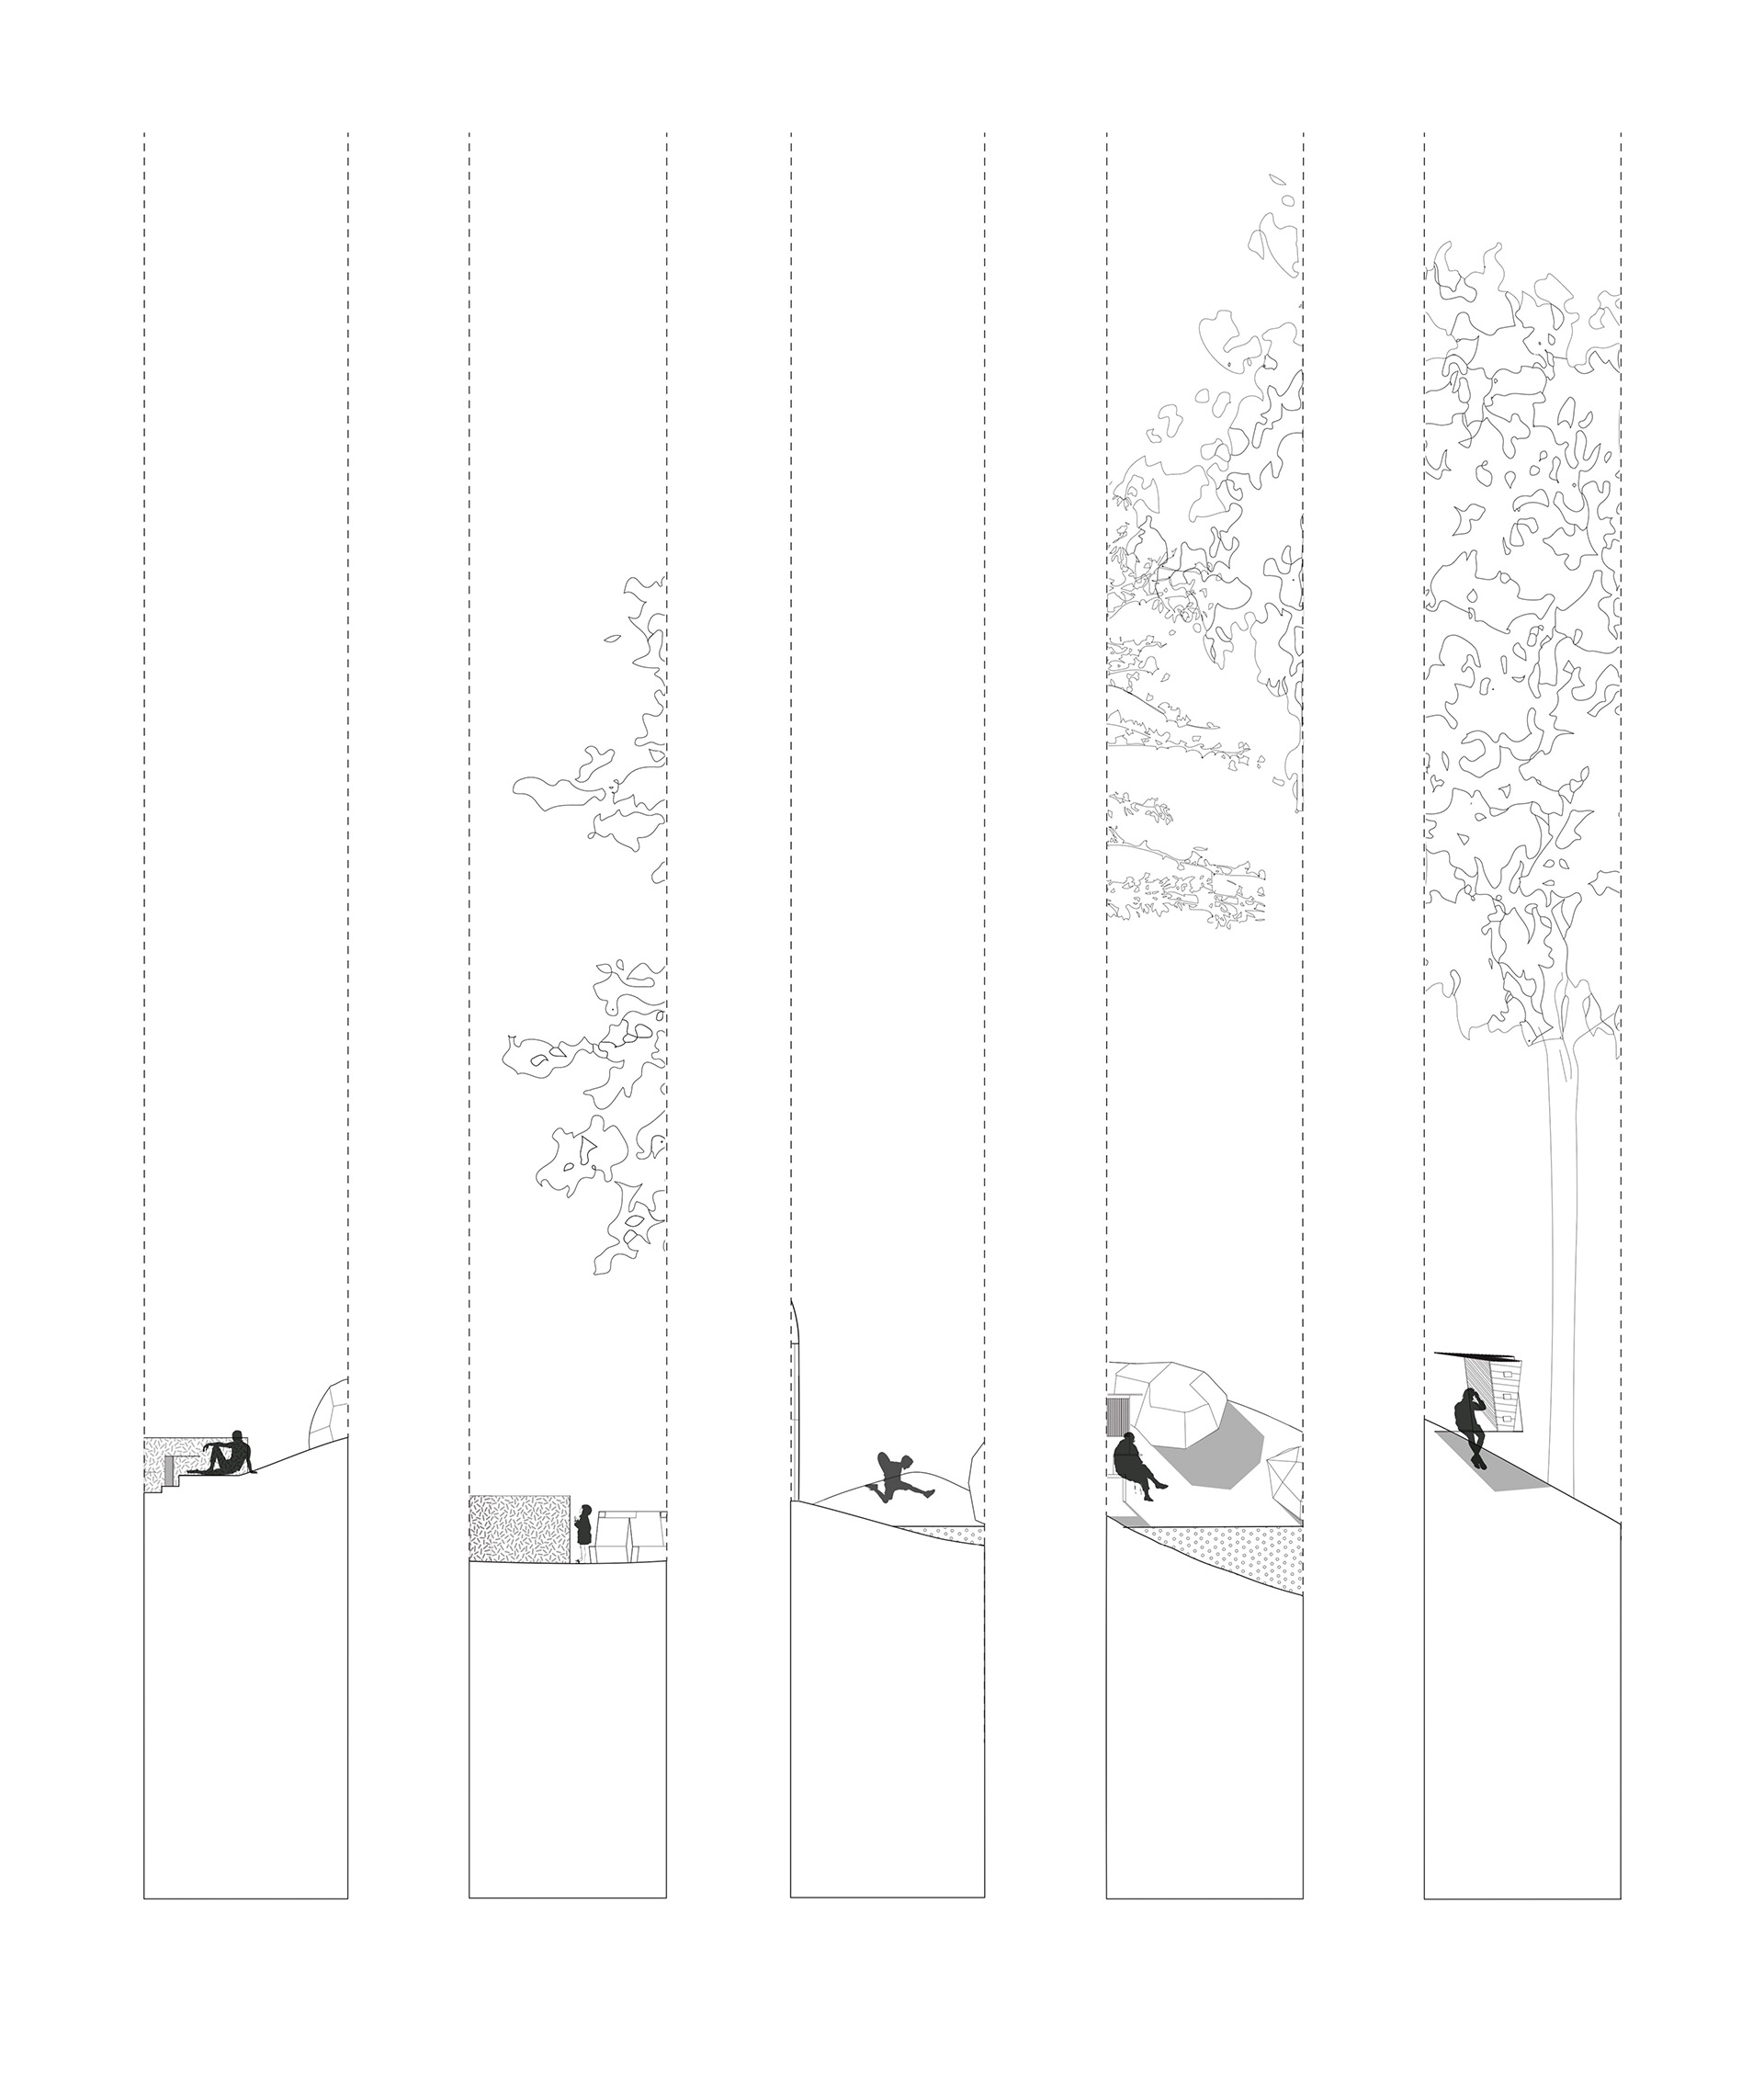 Enlarge Photo: Site Walk: Vignettes. By LI Huitong Lydia.